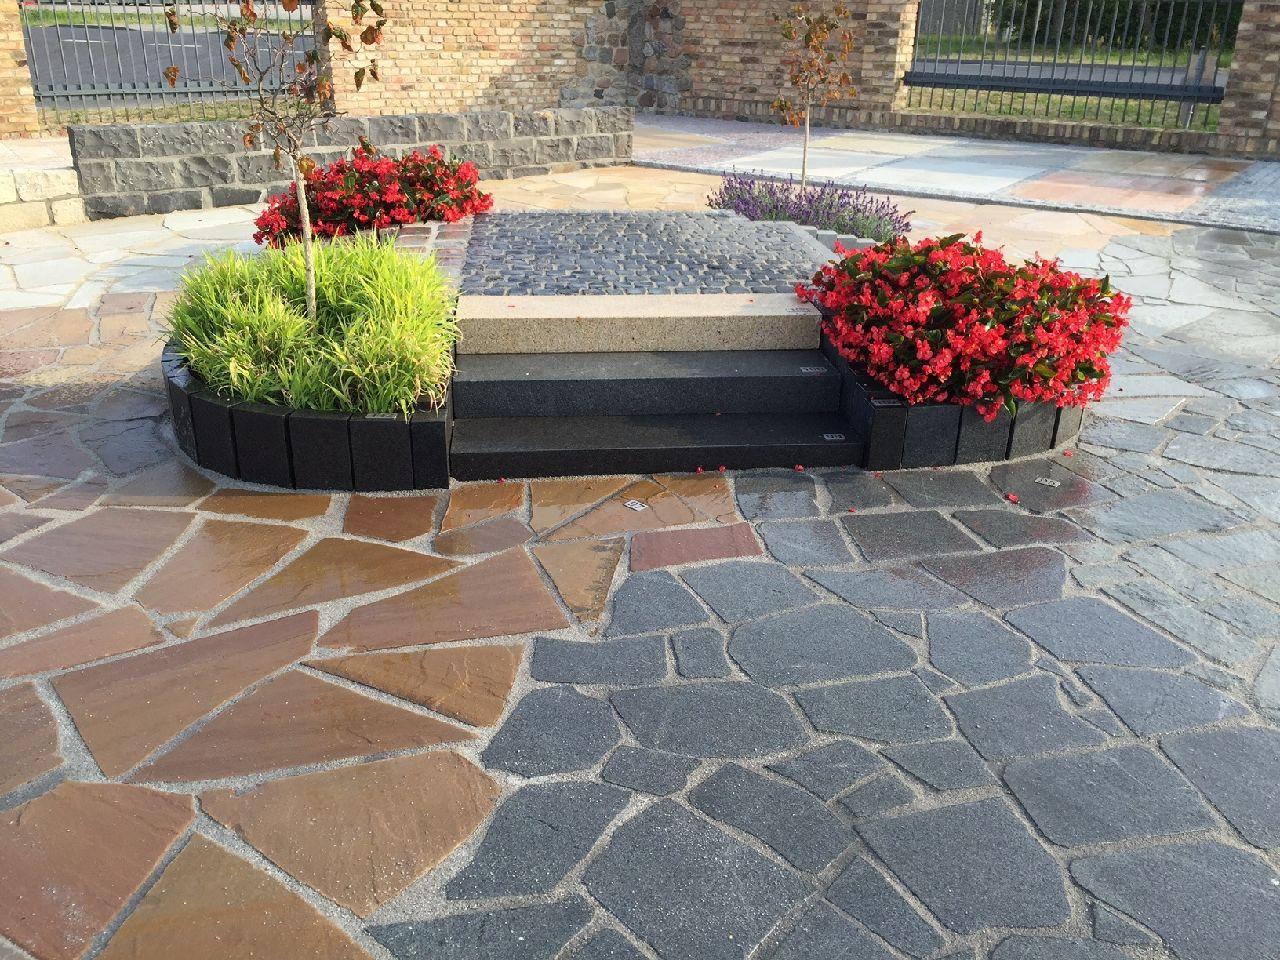 Polygonalplatten, Blockstufen, Palisaden | Granit, Quarzsandstein, Basalt